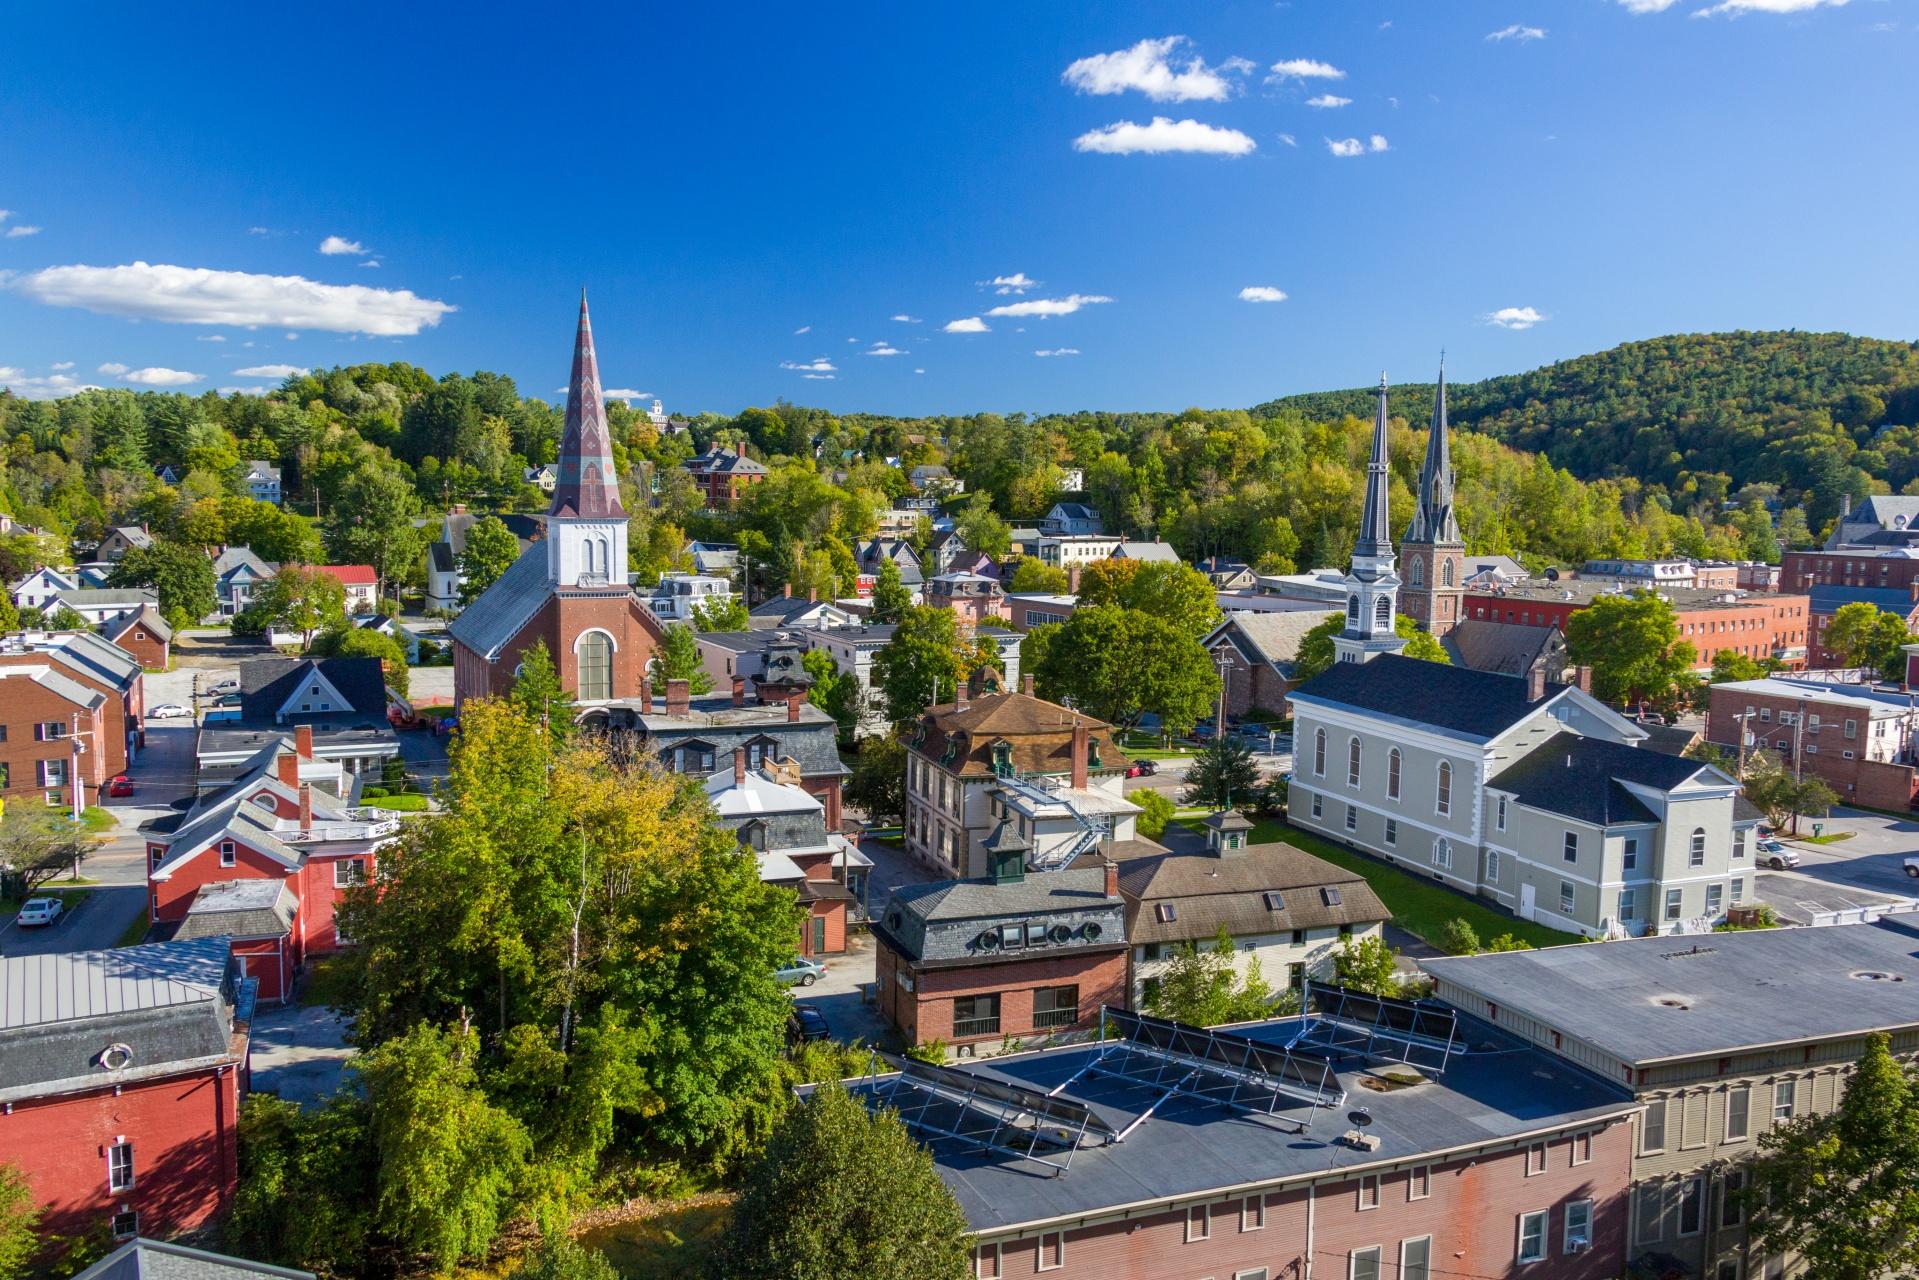 [Q] What is the least-populous U.S. capital city?